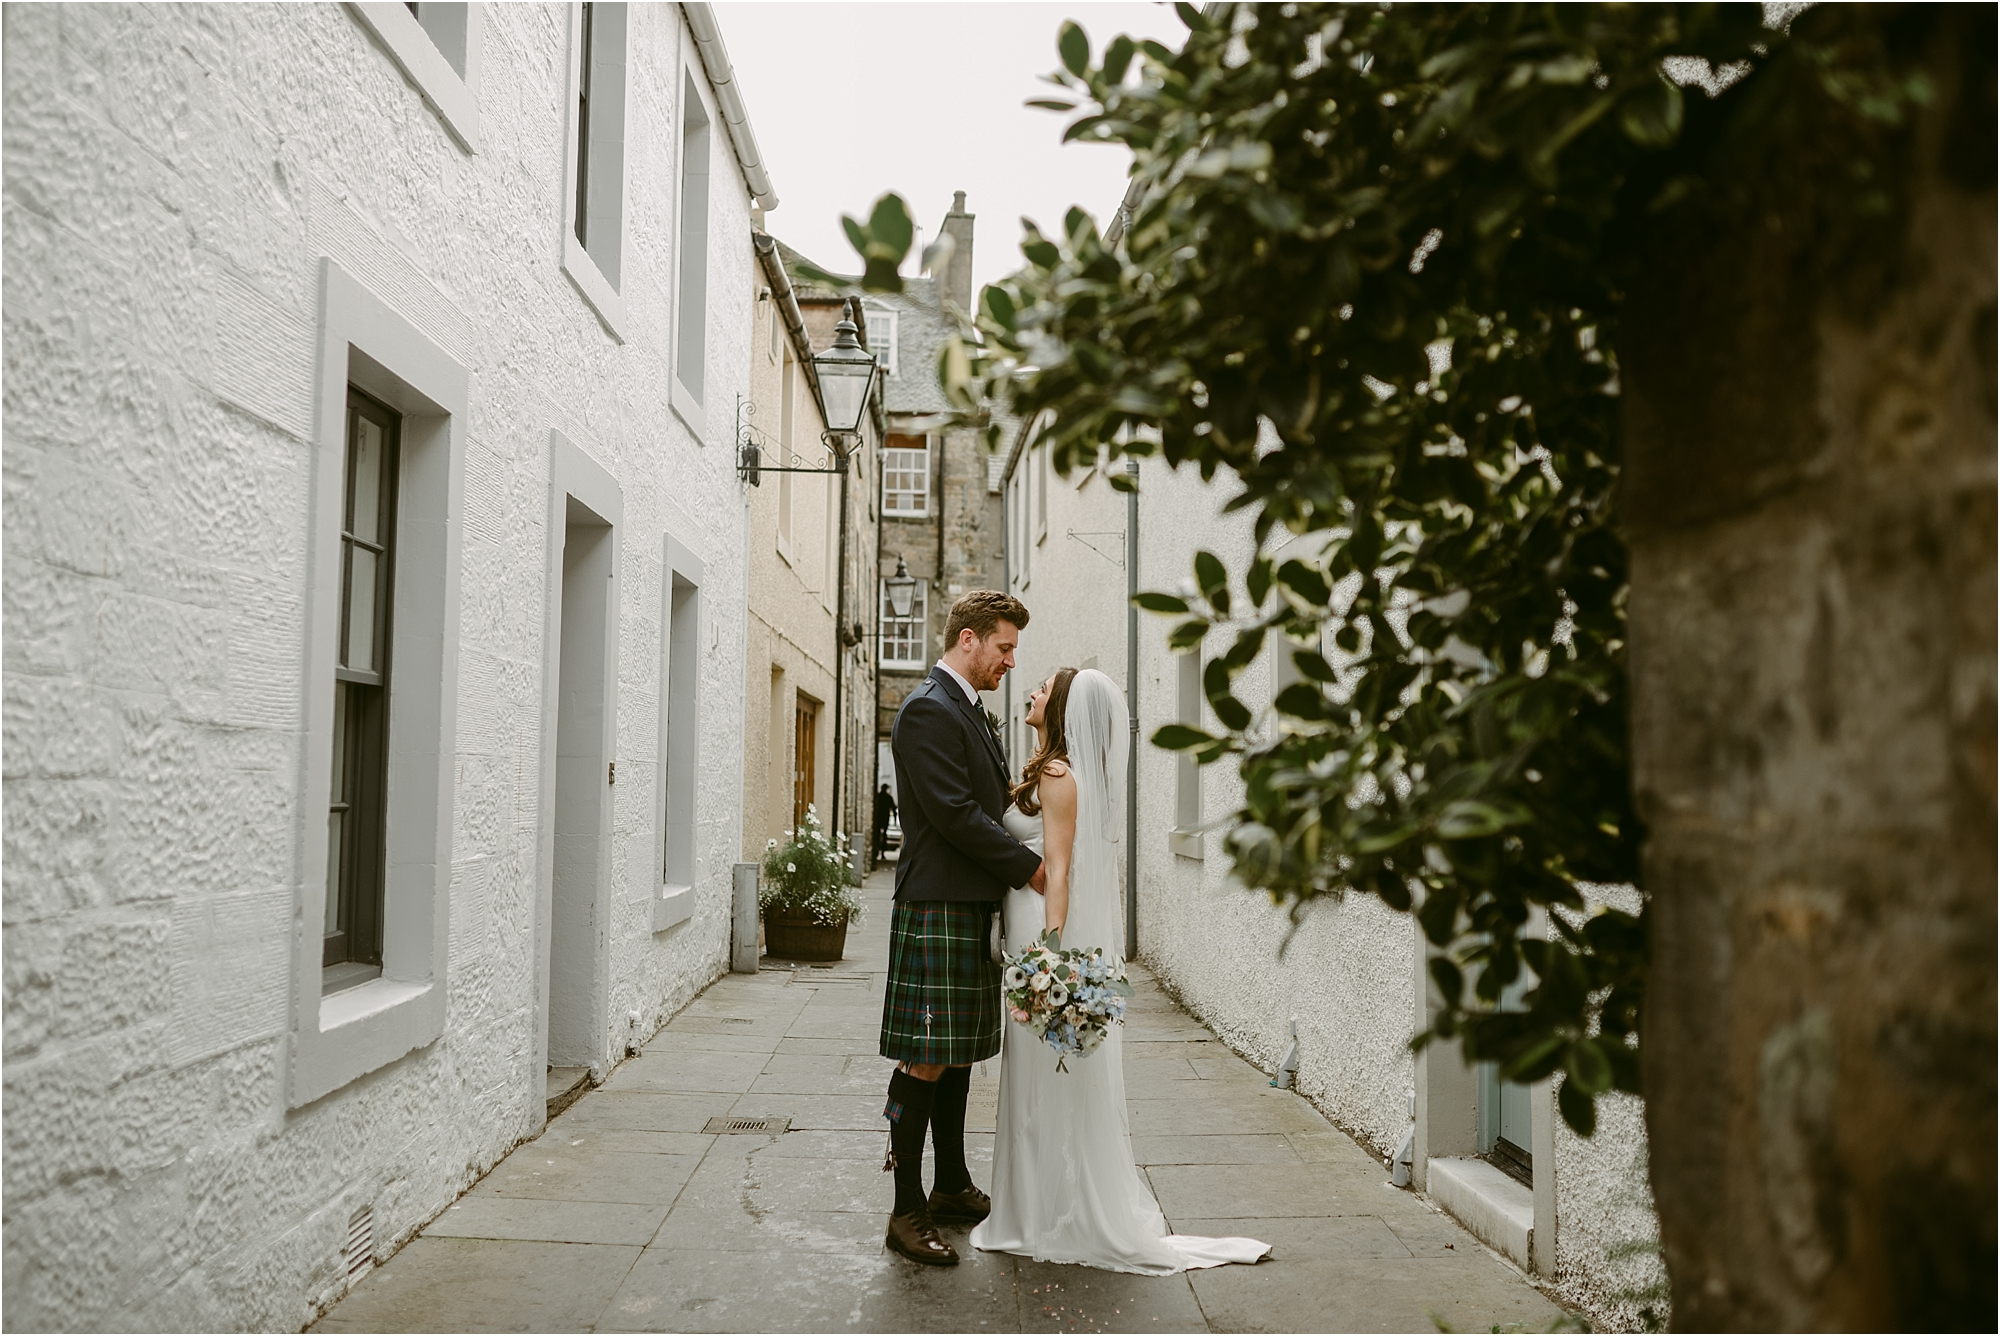 Scott+Joanna-Kinkell-Byre-wedding-fife-photography__0043.jpg